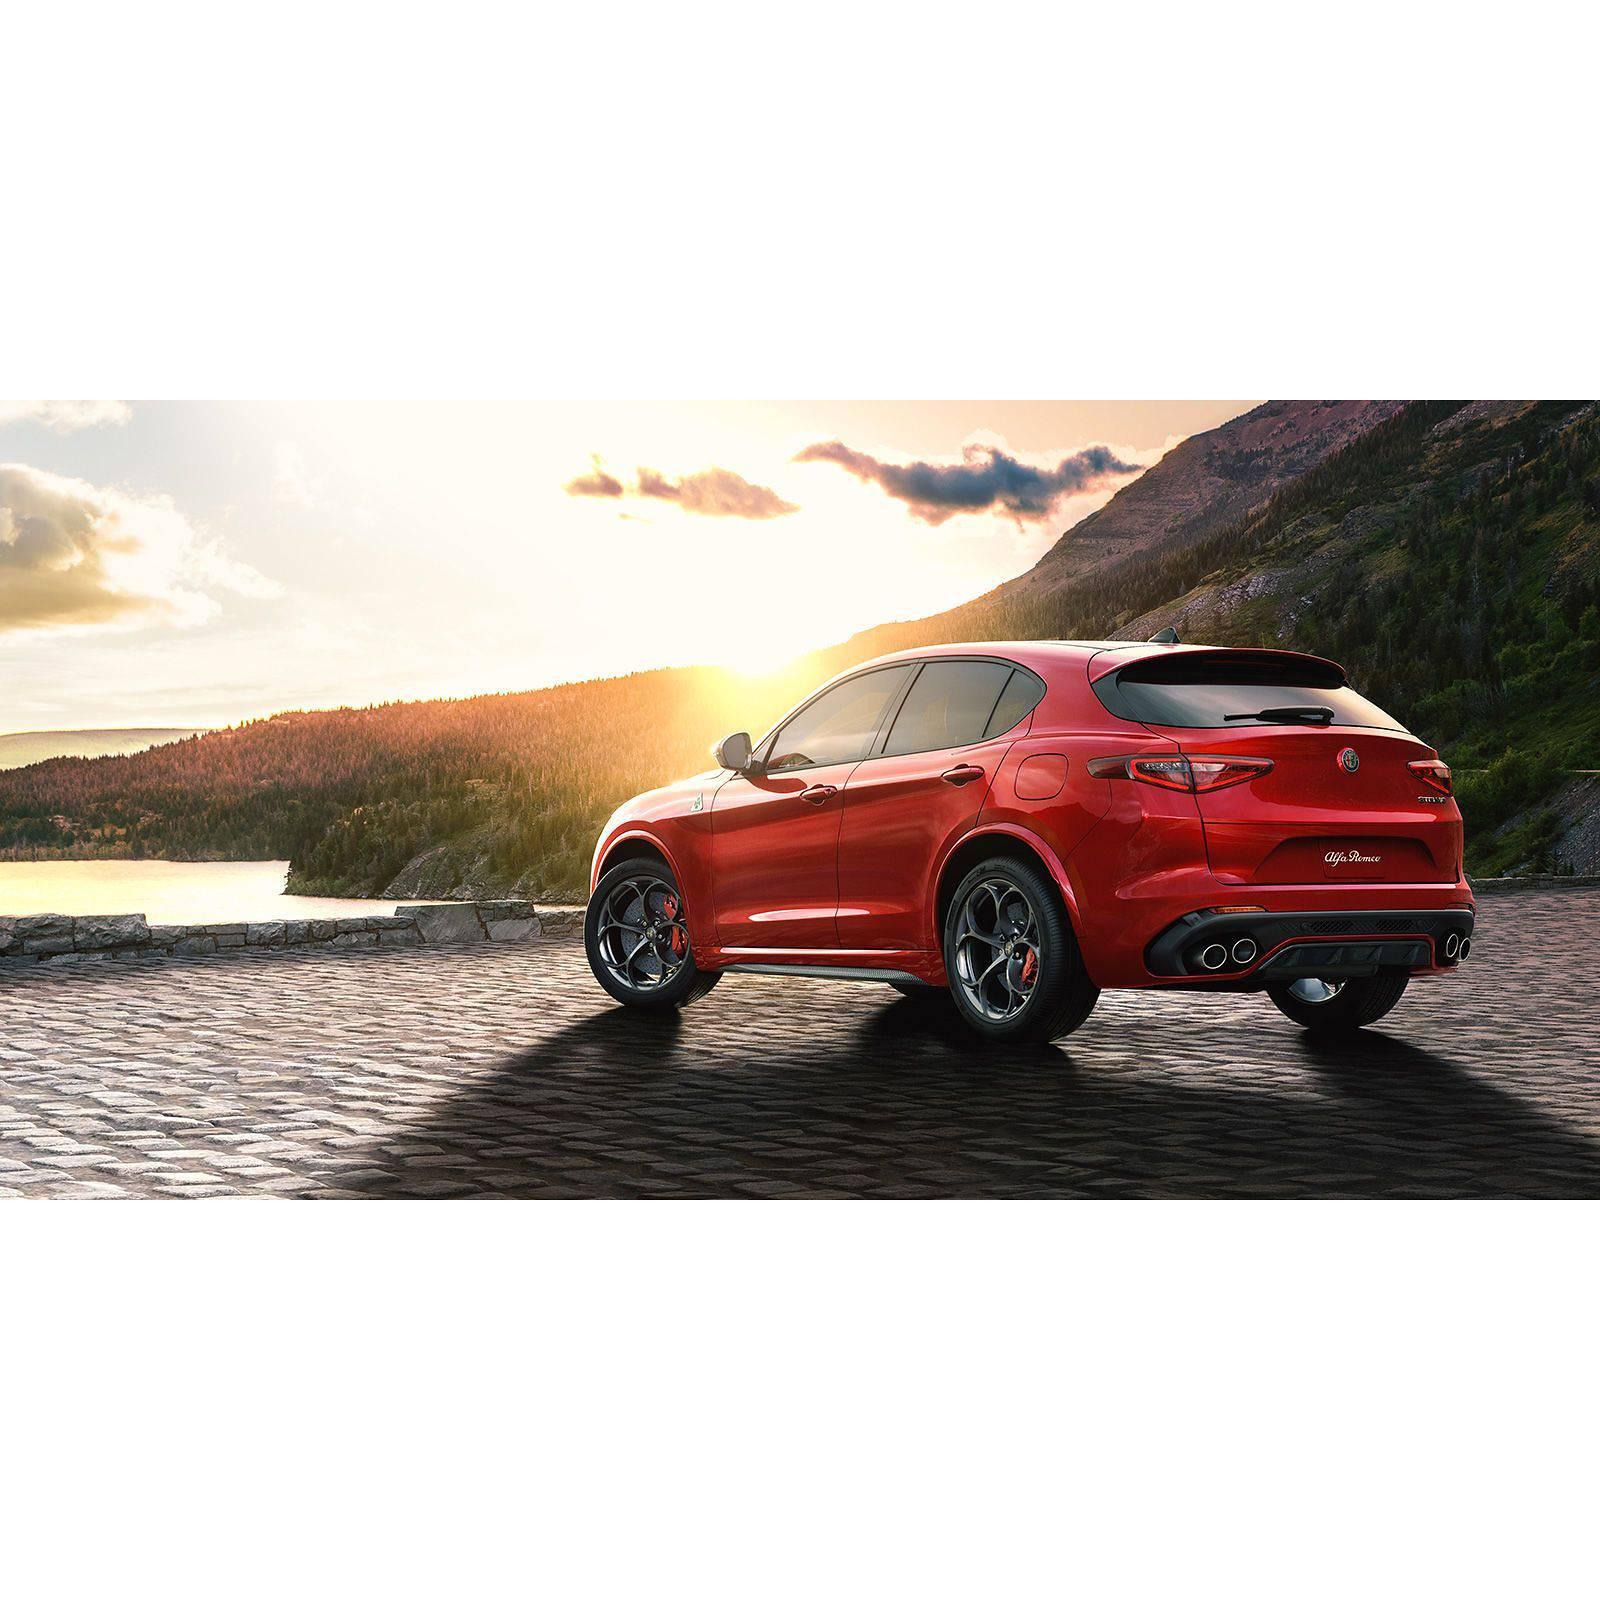 VTDOUQ Passend F/ür Alfa Romeo Stelvio SUV 2017-2019 Carbon Fiber Cf Heckdachfenster Spoilerfl/ügel